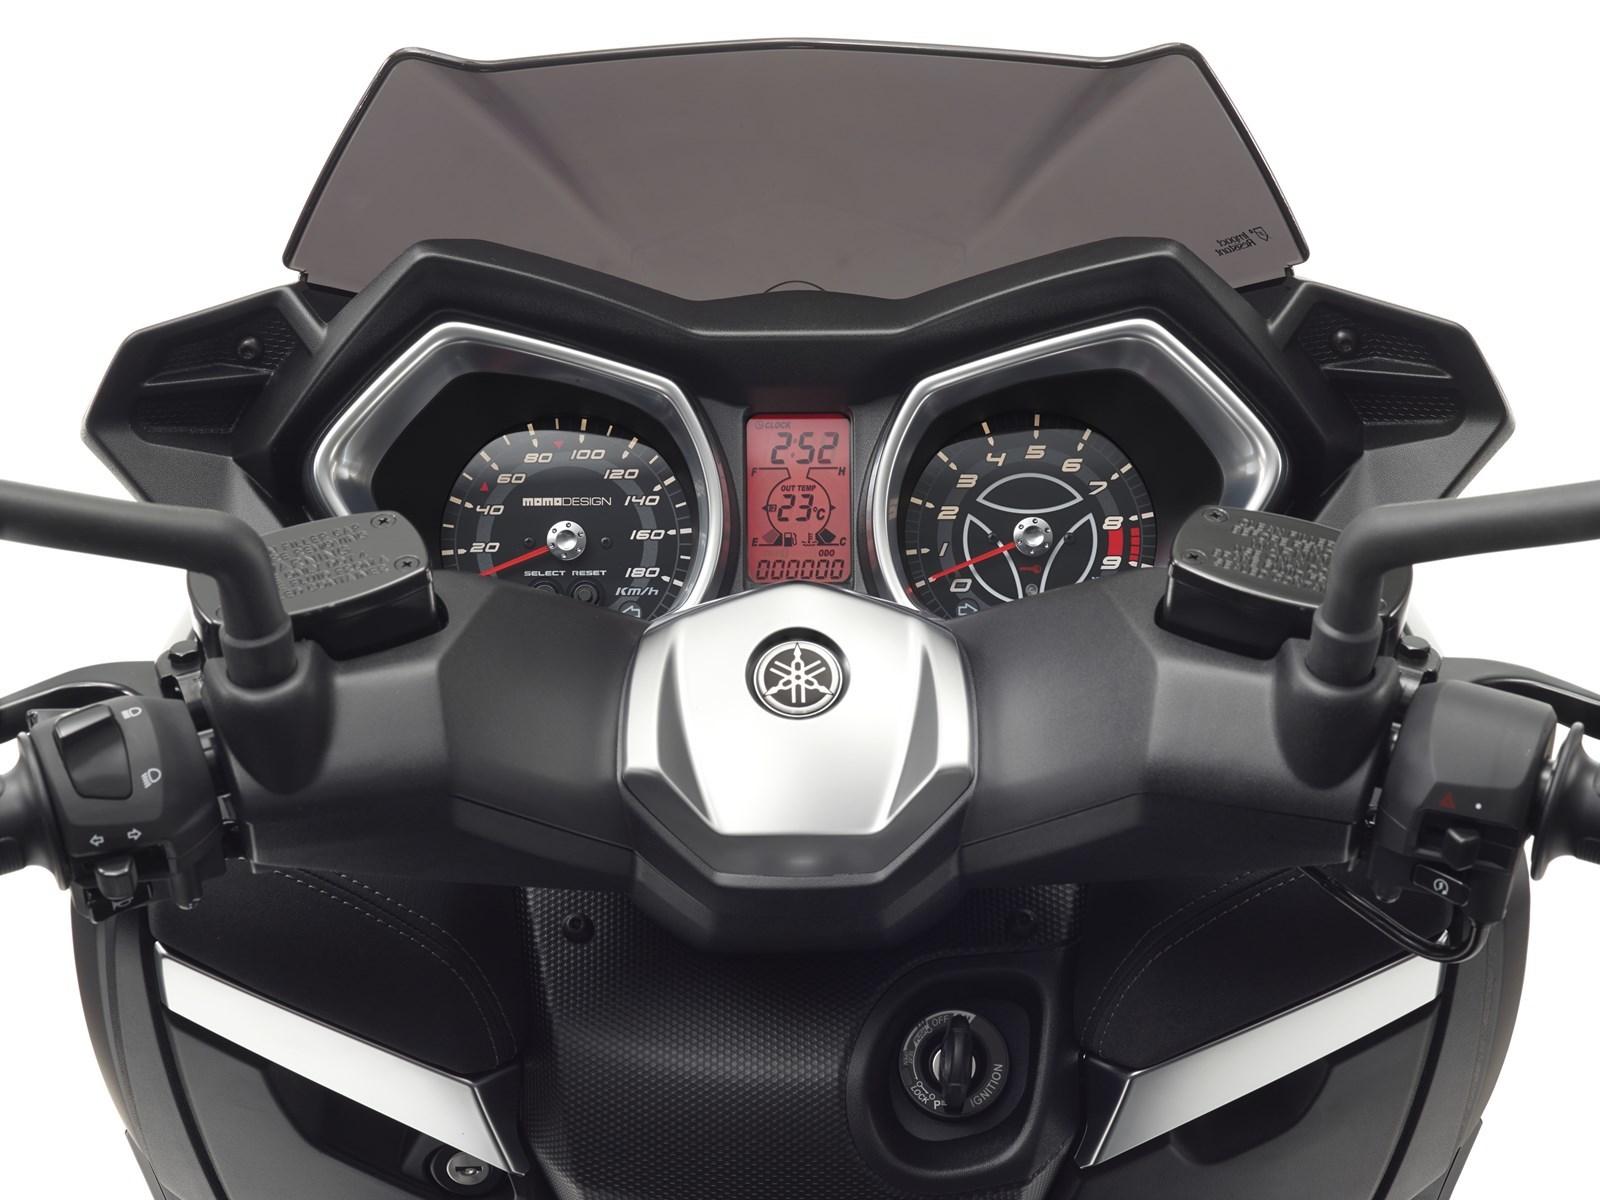 Foto de Yamaha X-MAX 400 MOMODESIGN, estudio y detalles (15/33)